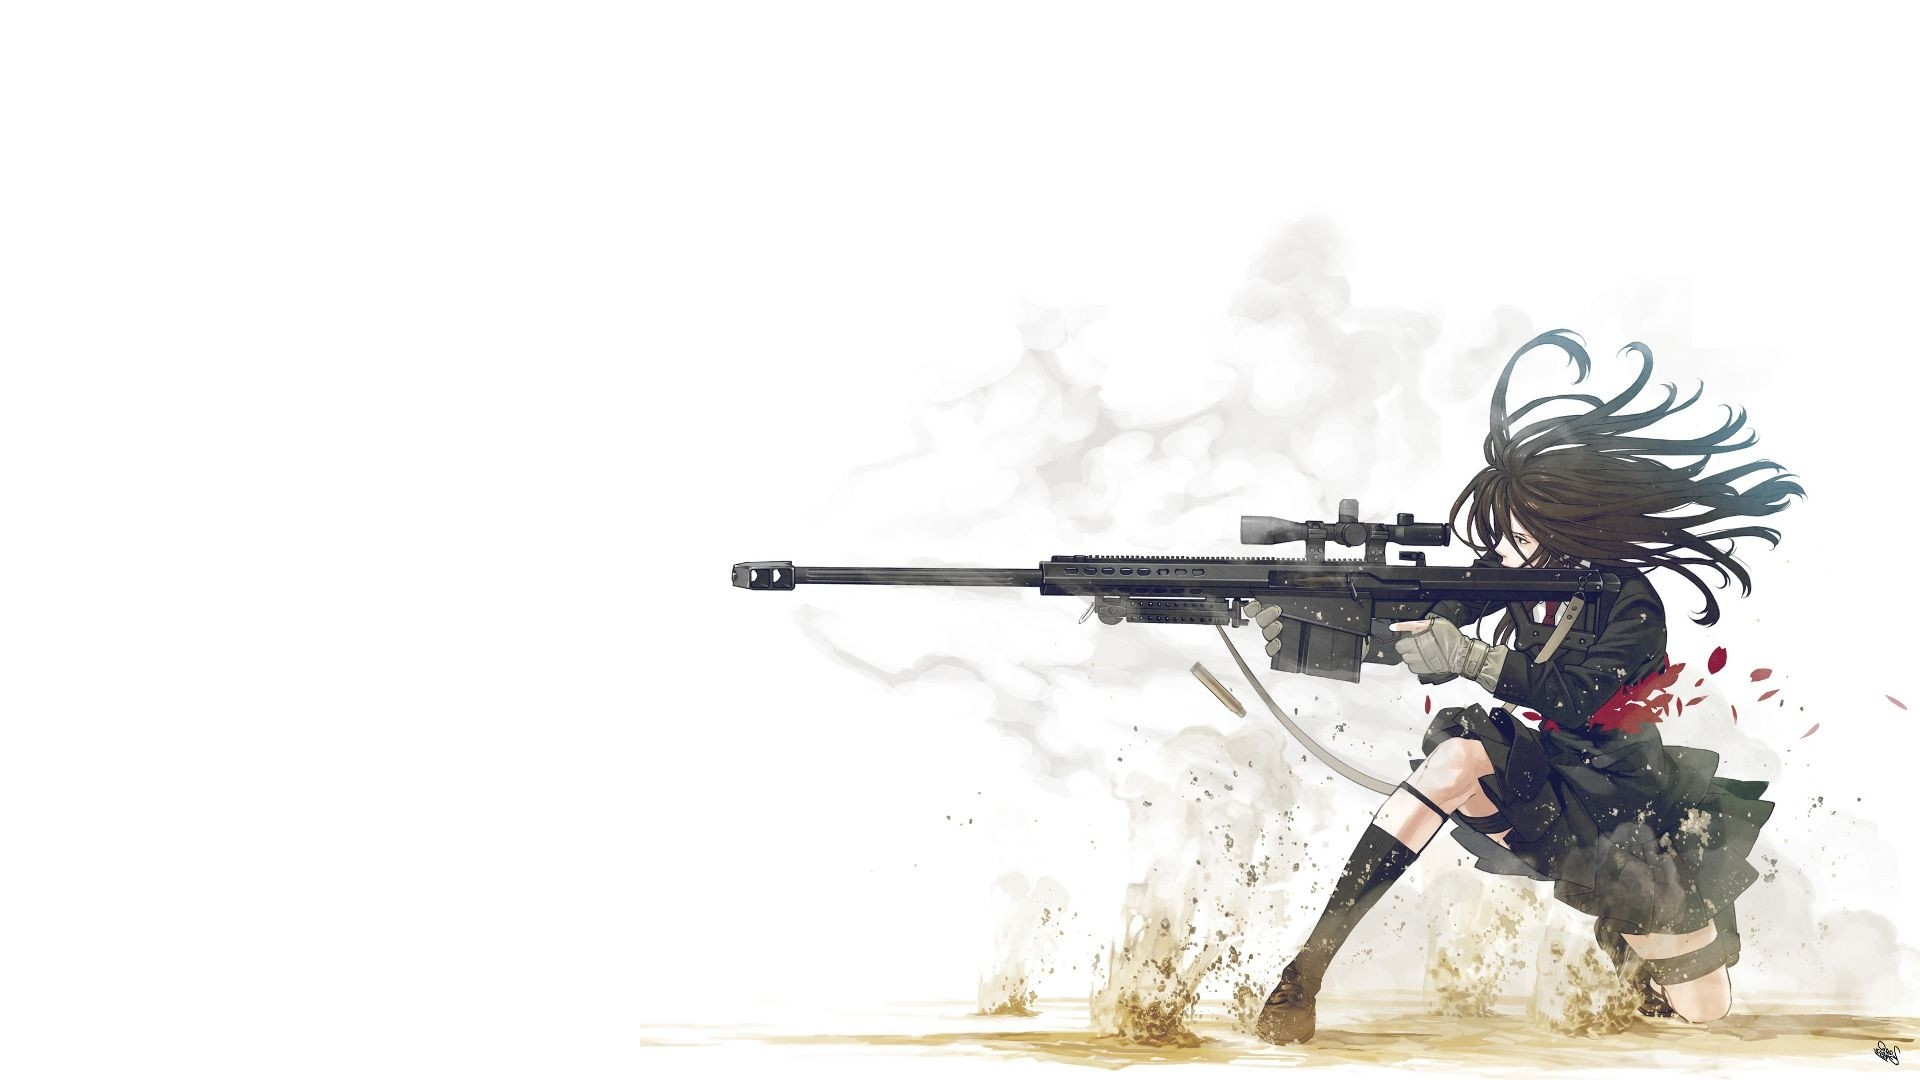 1920x1080, New Anime Girl Gun Wallpaper Free - Anime Wallpaper Gun - HD Wallpaper